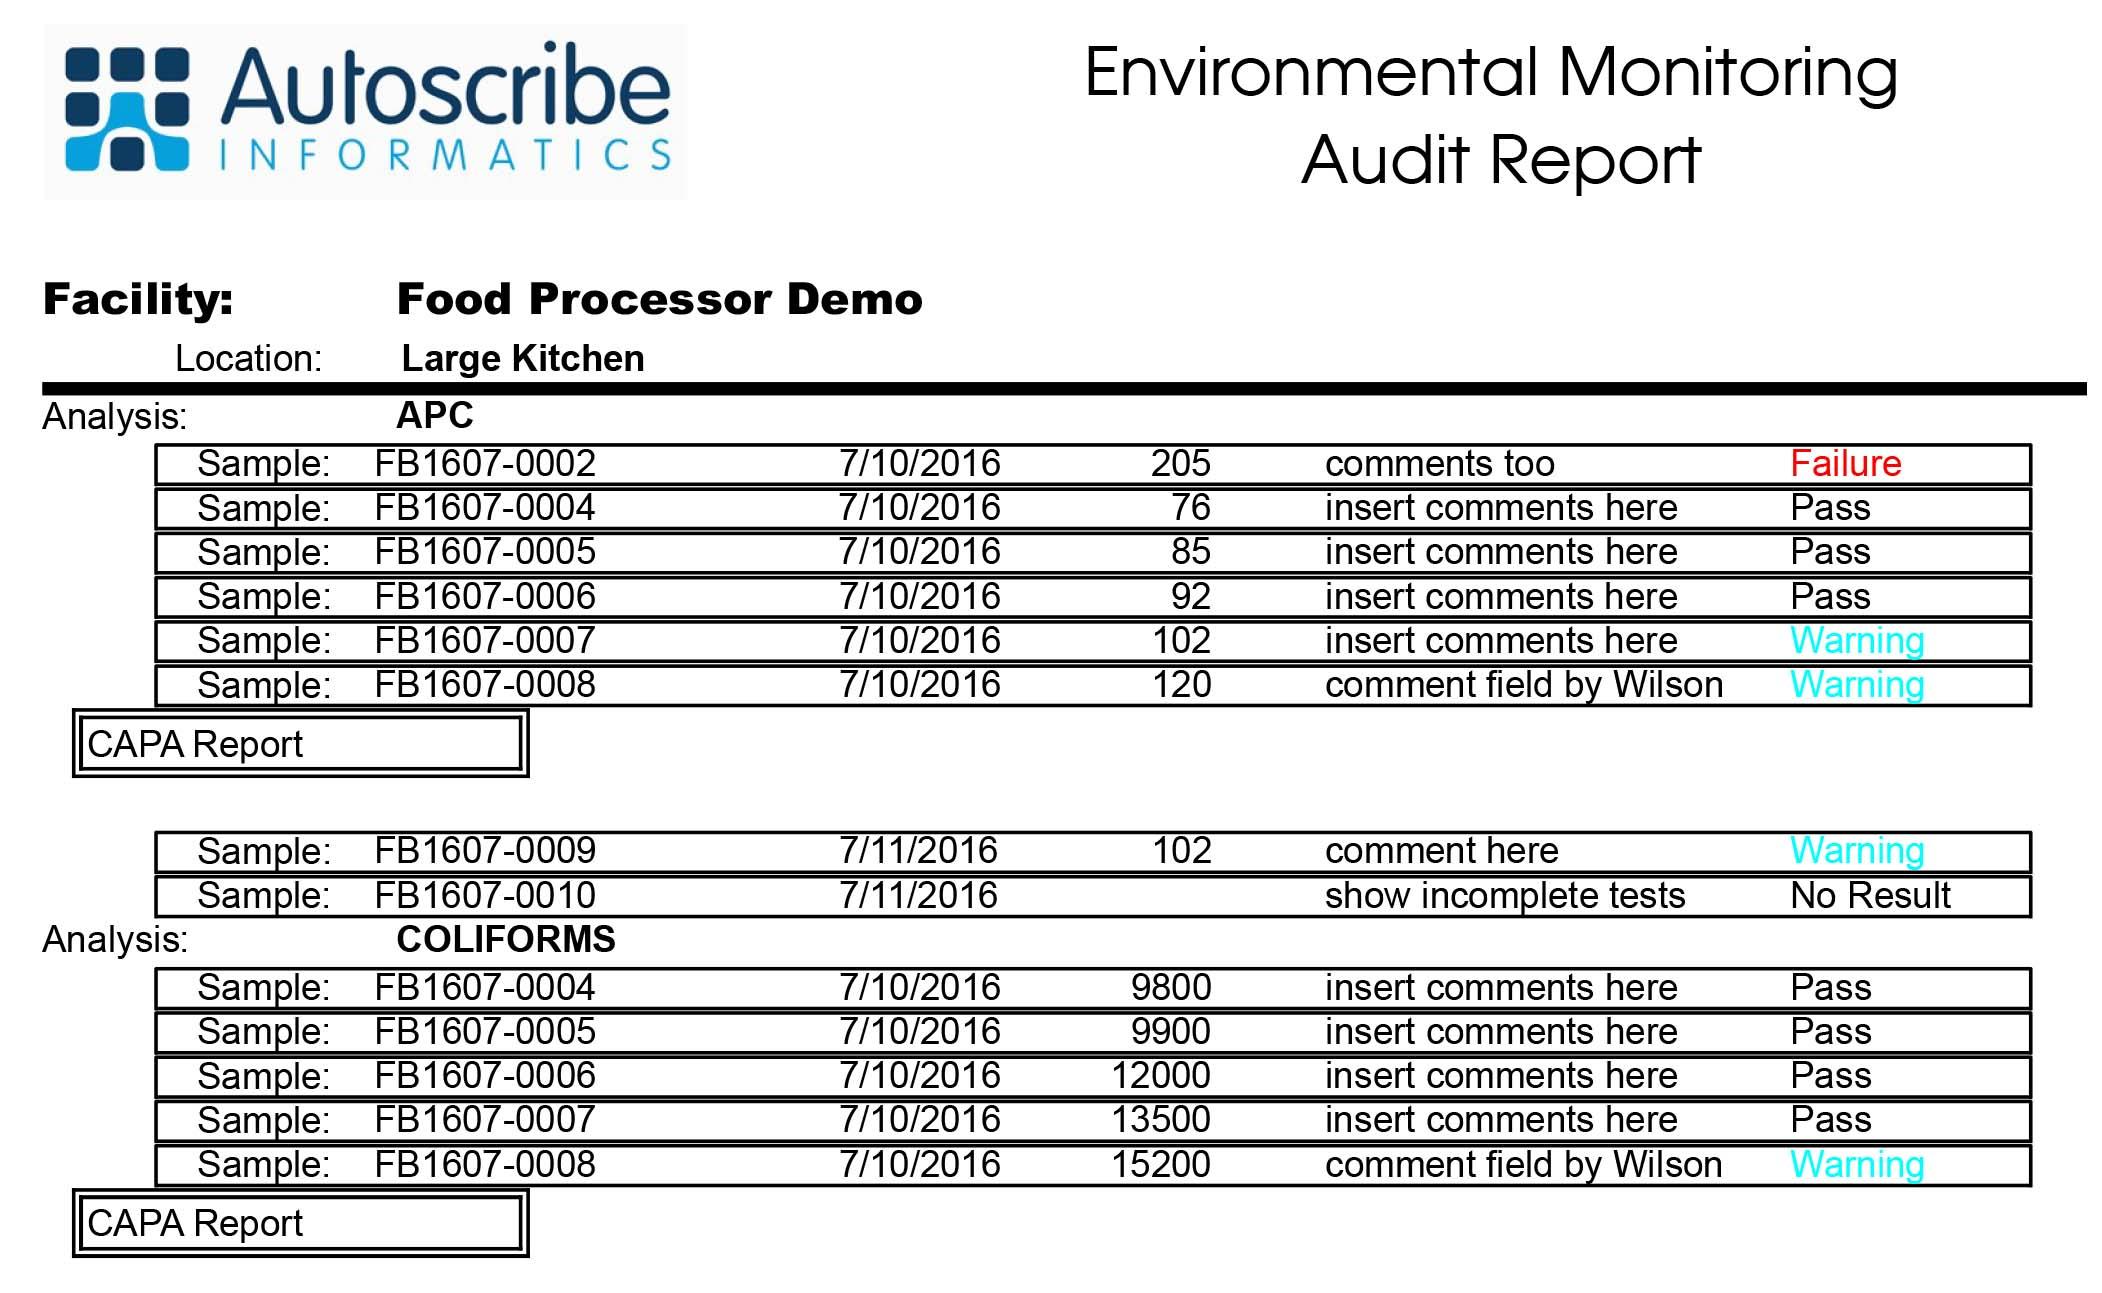 Environmental Monitoring Audit Report